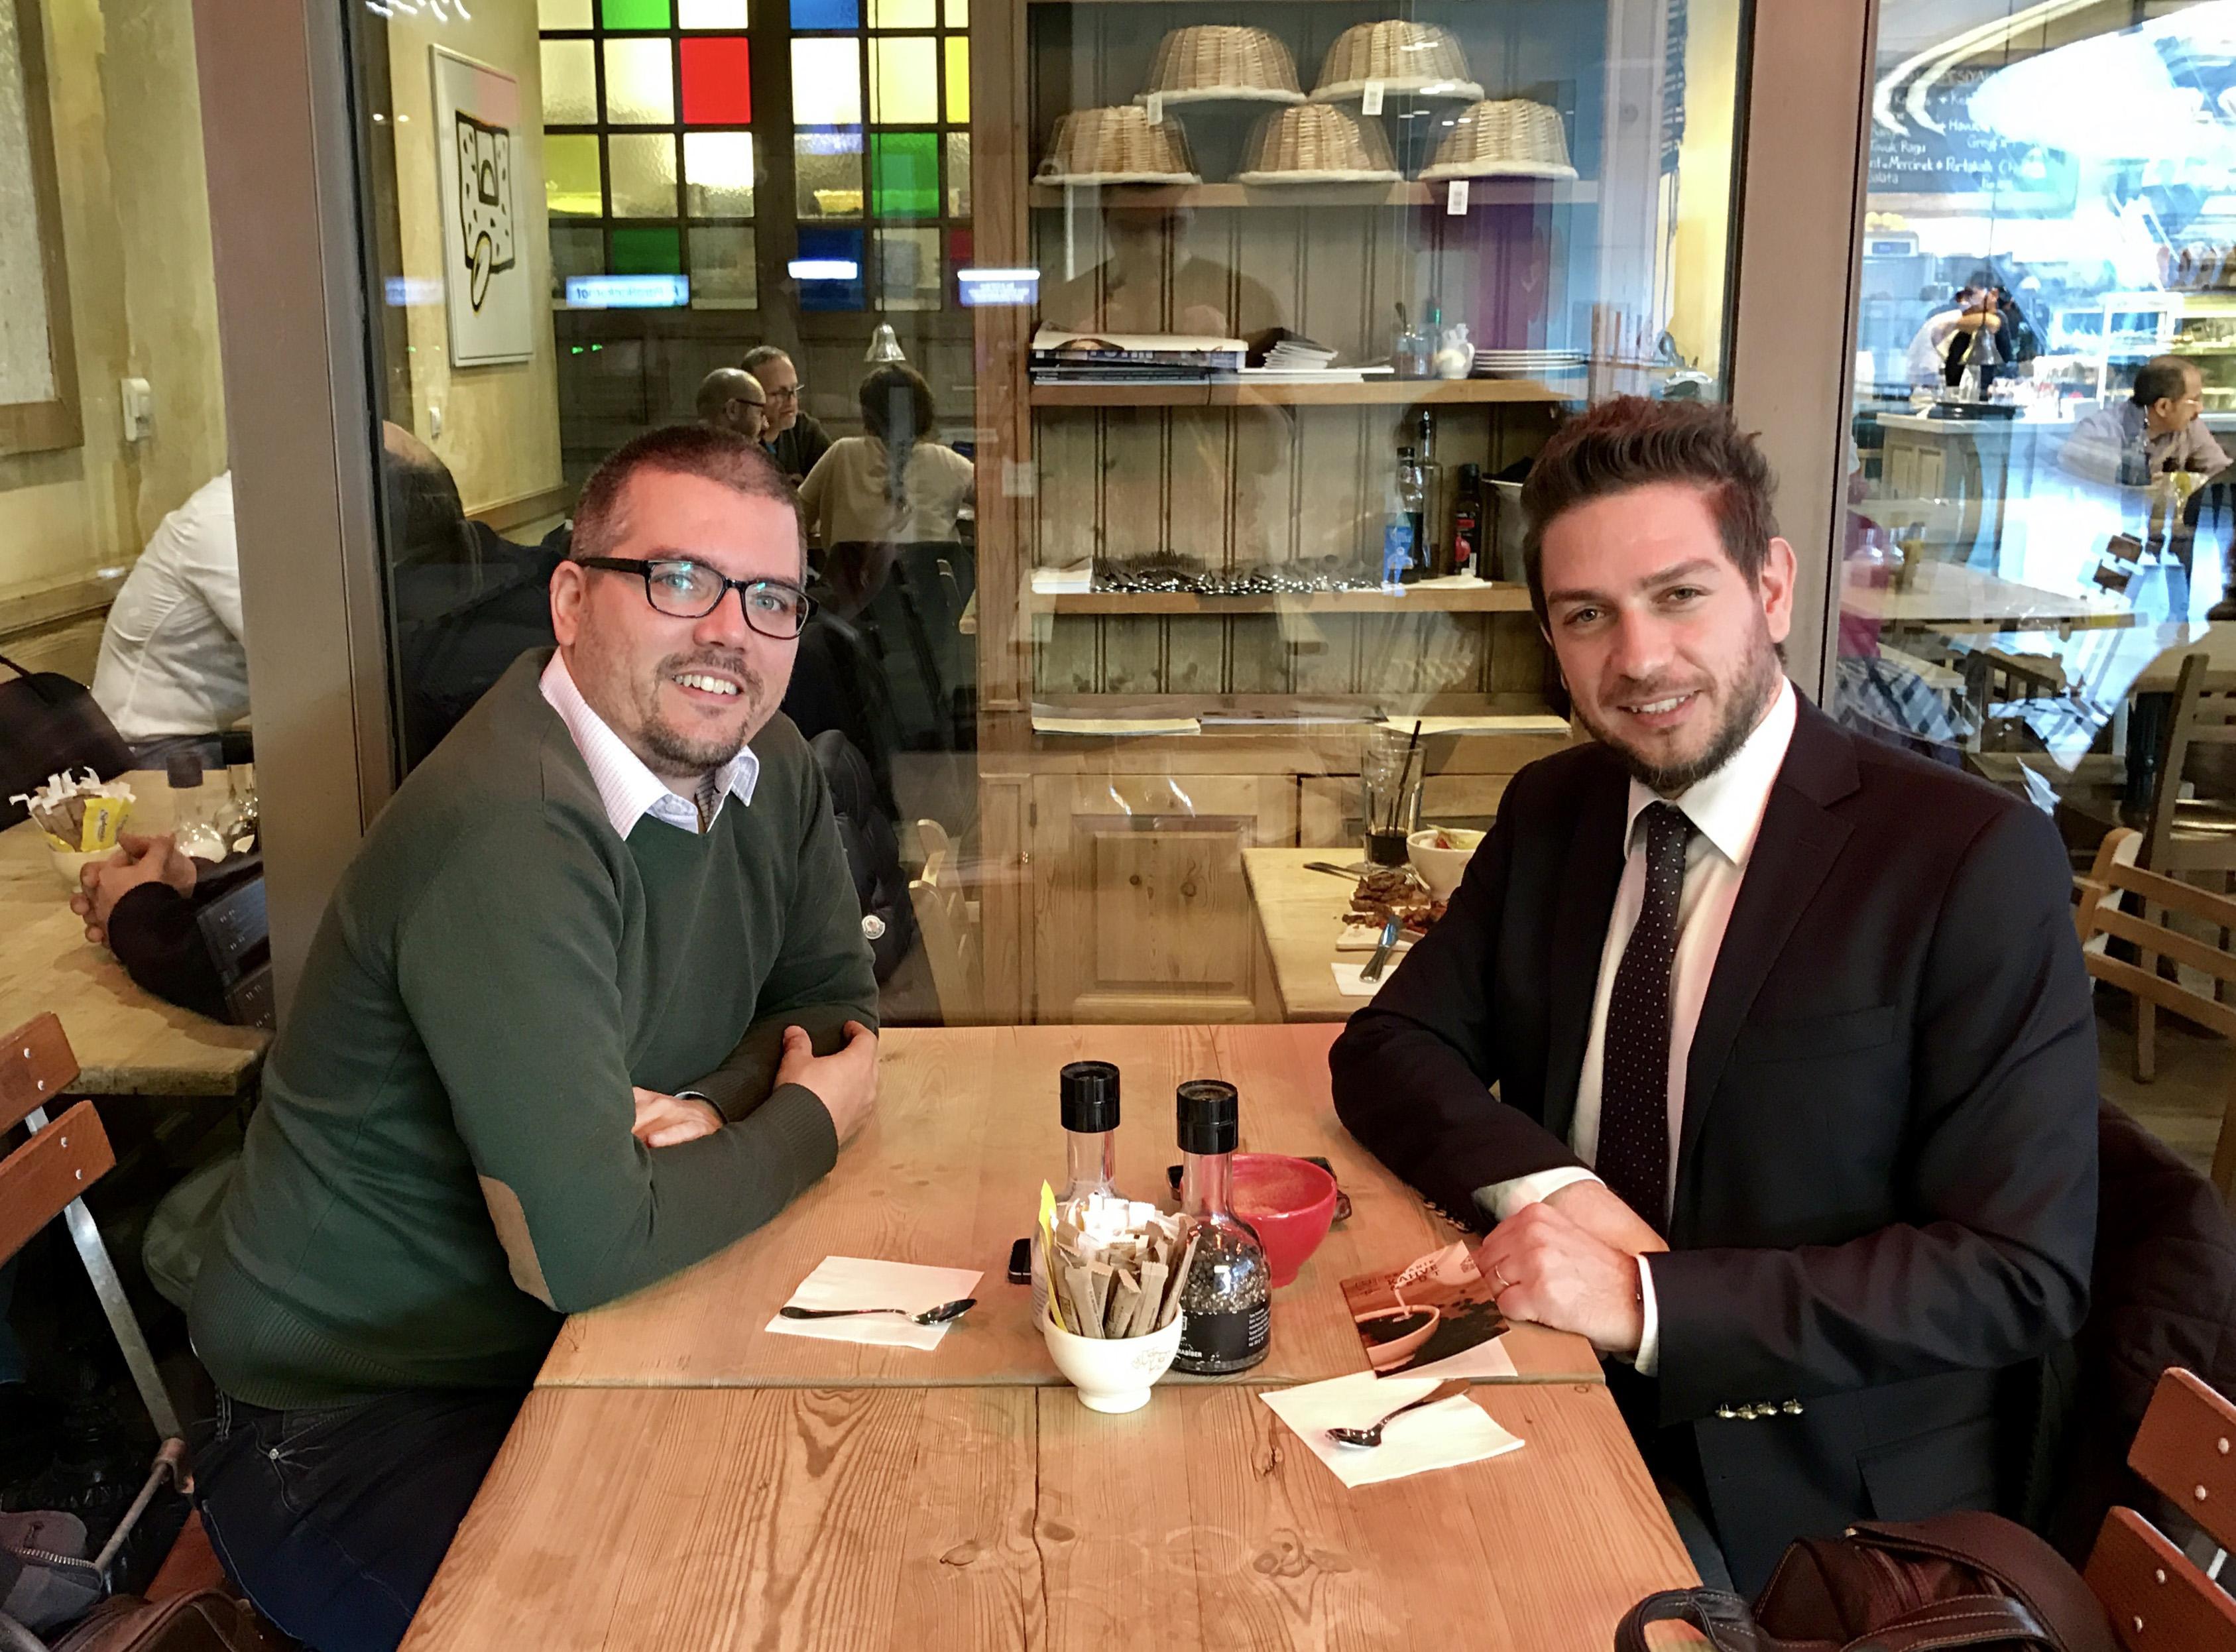 Alp Köksal & Niels Van Der Linden